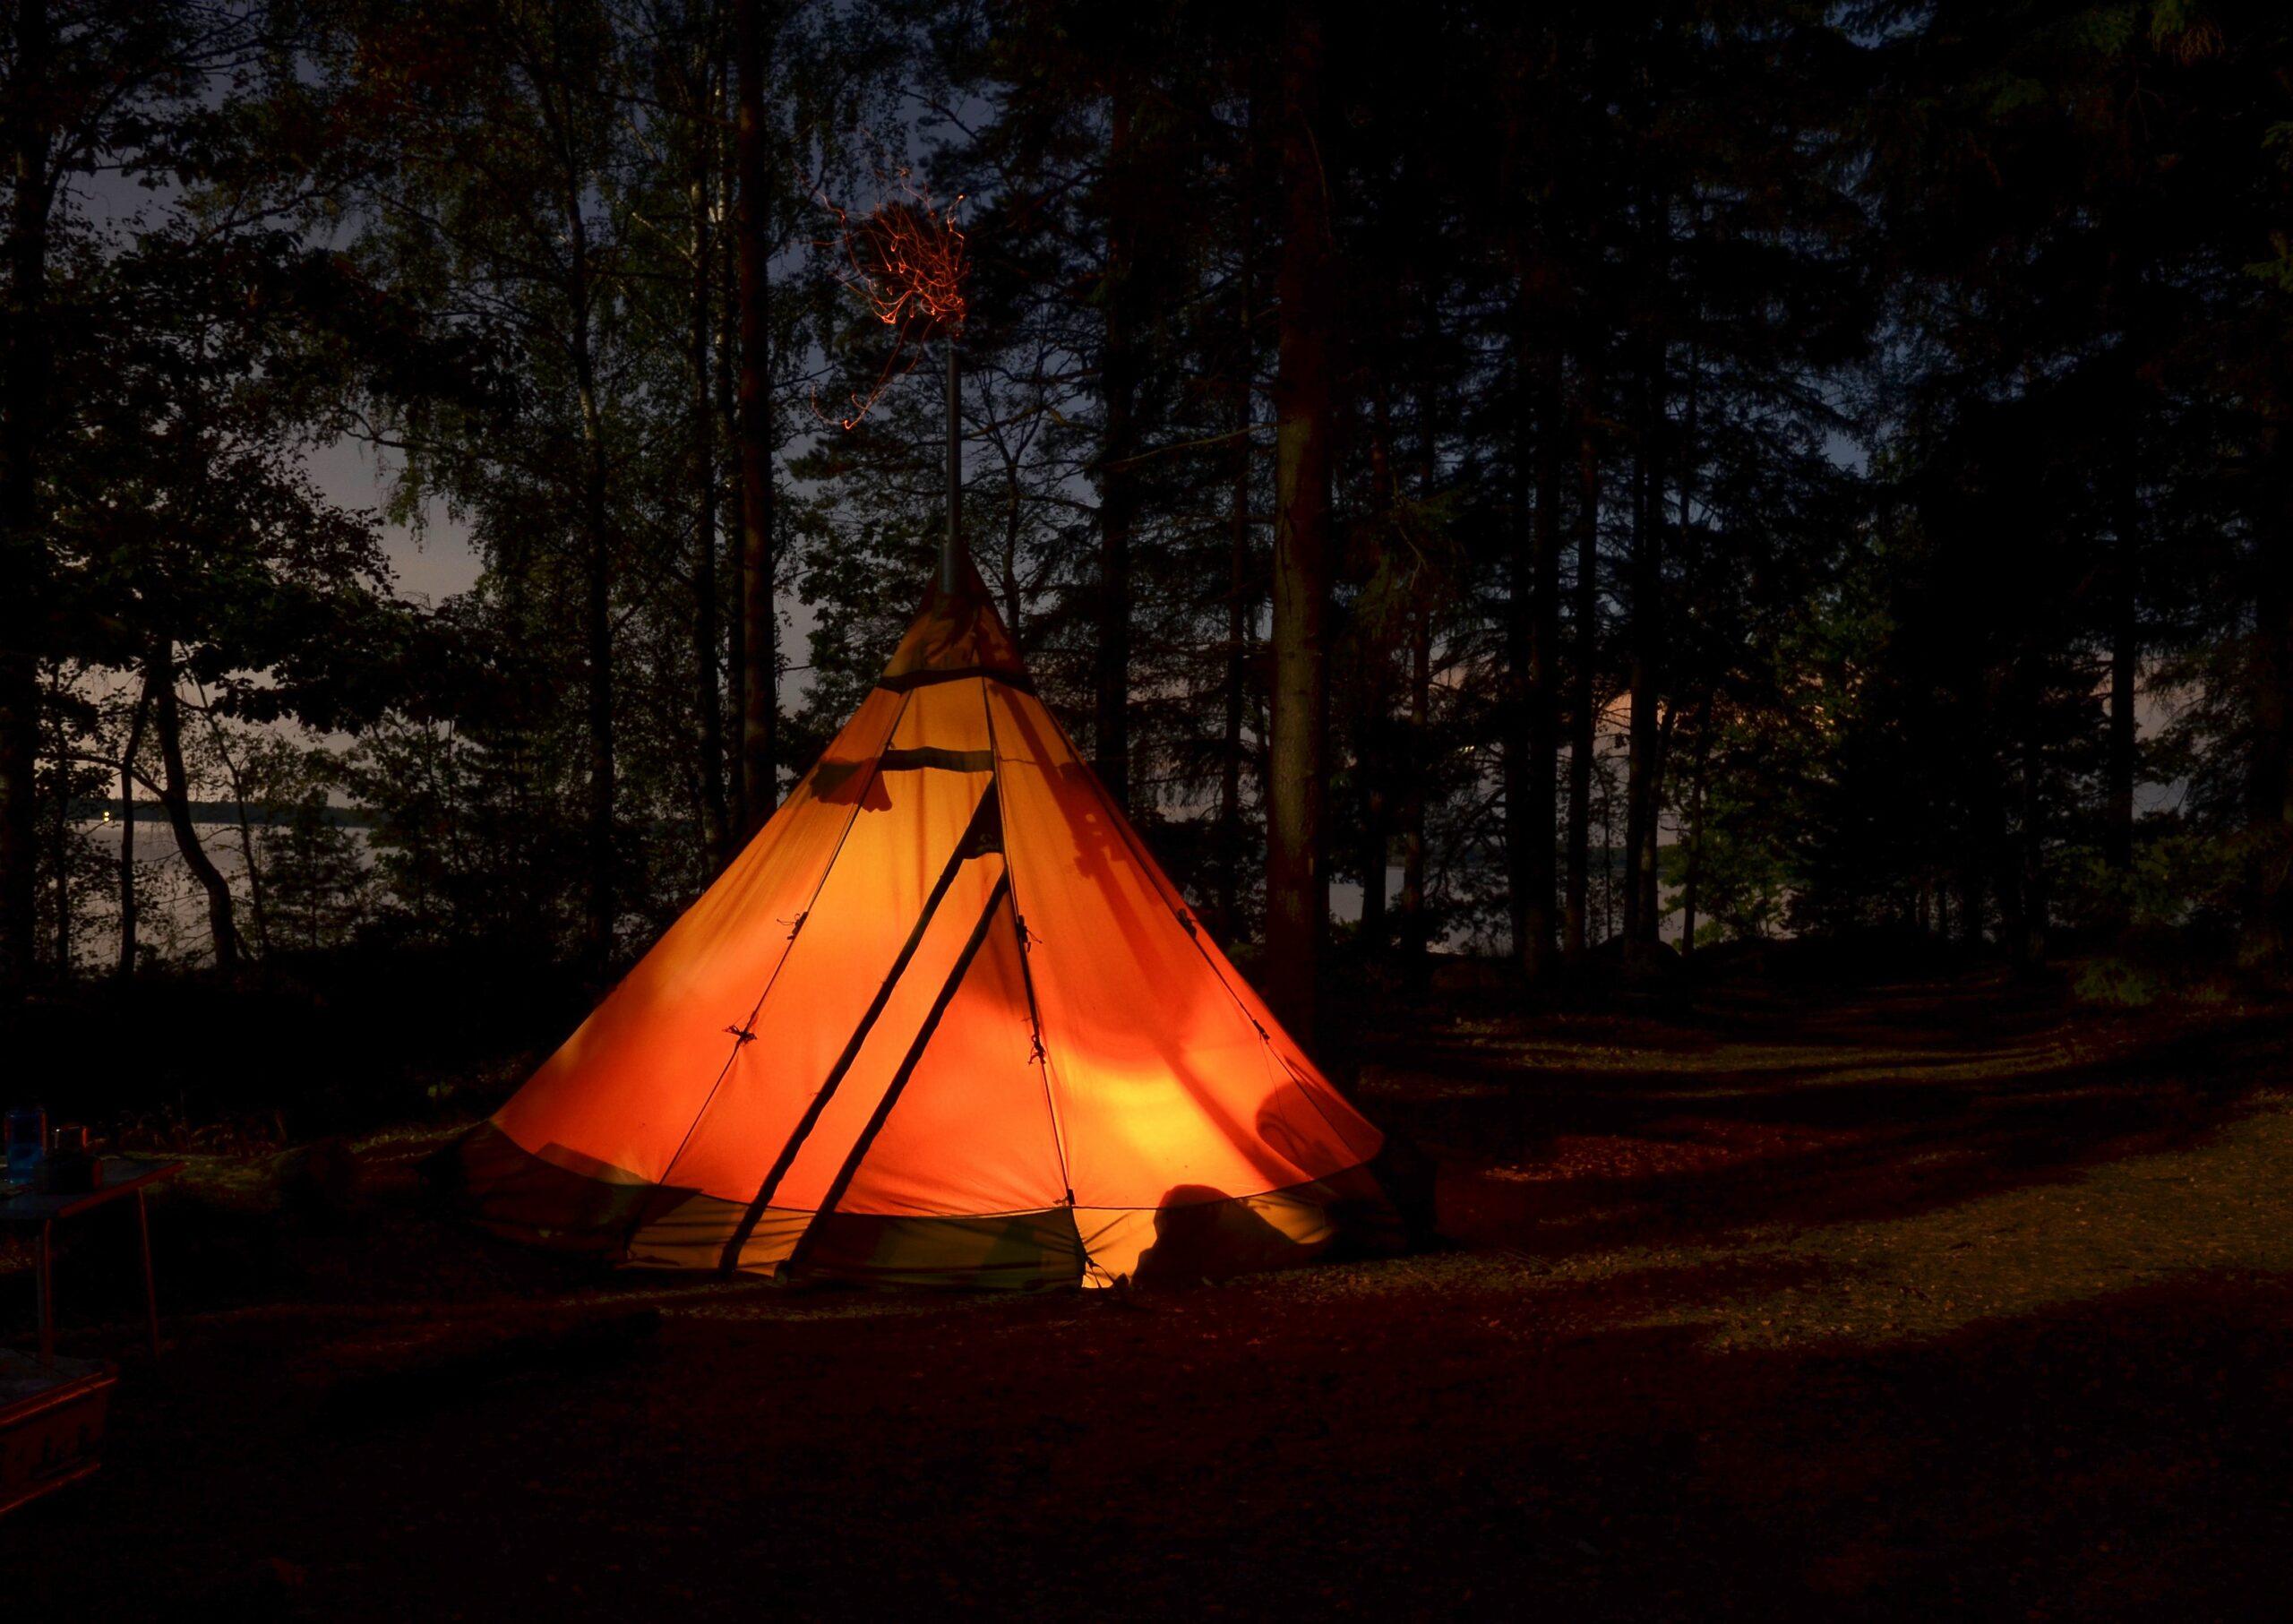 tent flashlight indoor camping halloween evolve blog